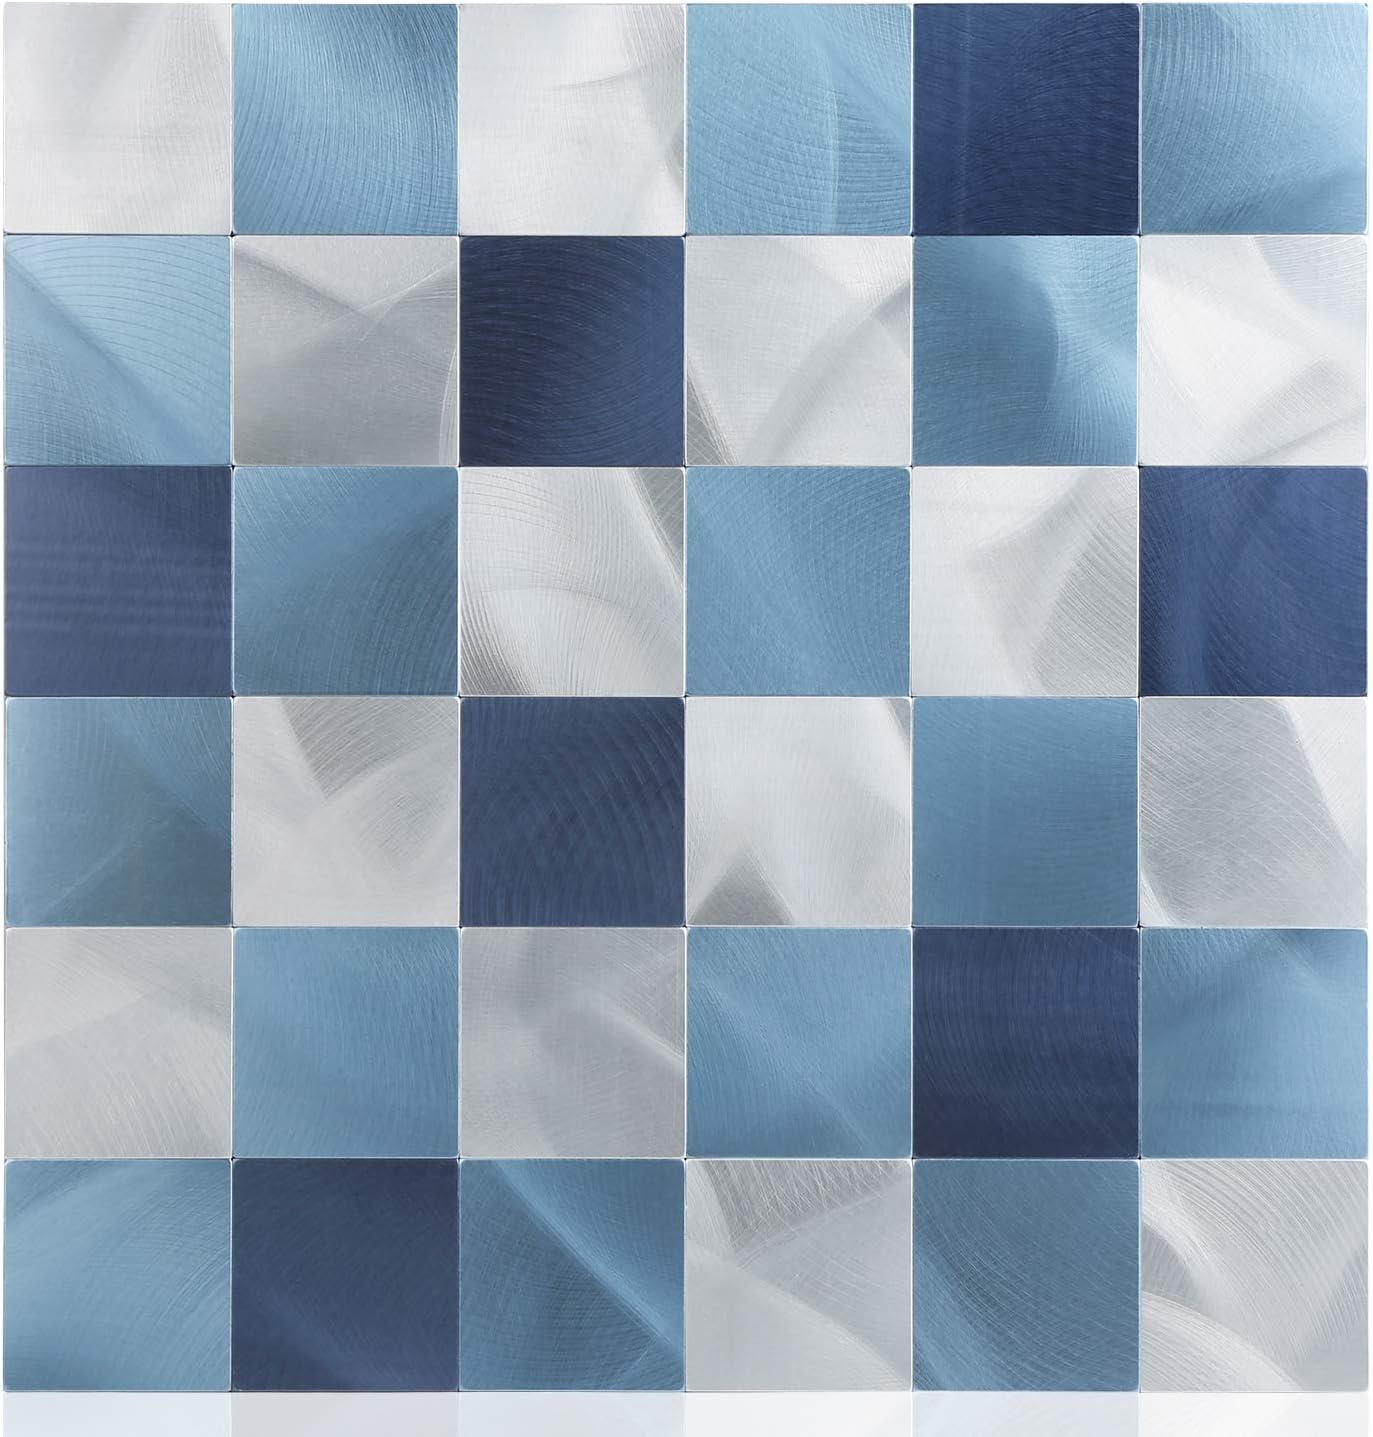 Amazon Com Homeymosaic Peel And Stick Backsplash Tile For Kitchen Aluminum Surface Wall Decor Metal Stickers Square 1 Sheet Gradient Dark Blue Home Improvement